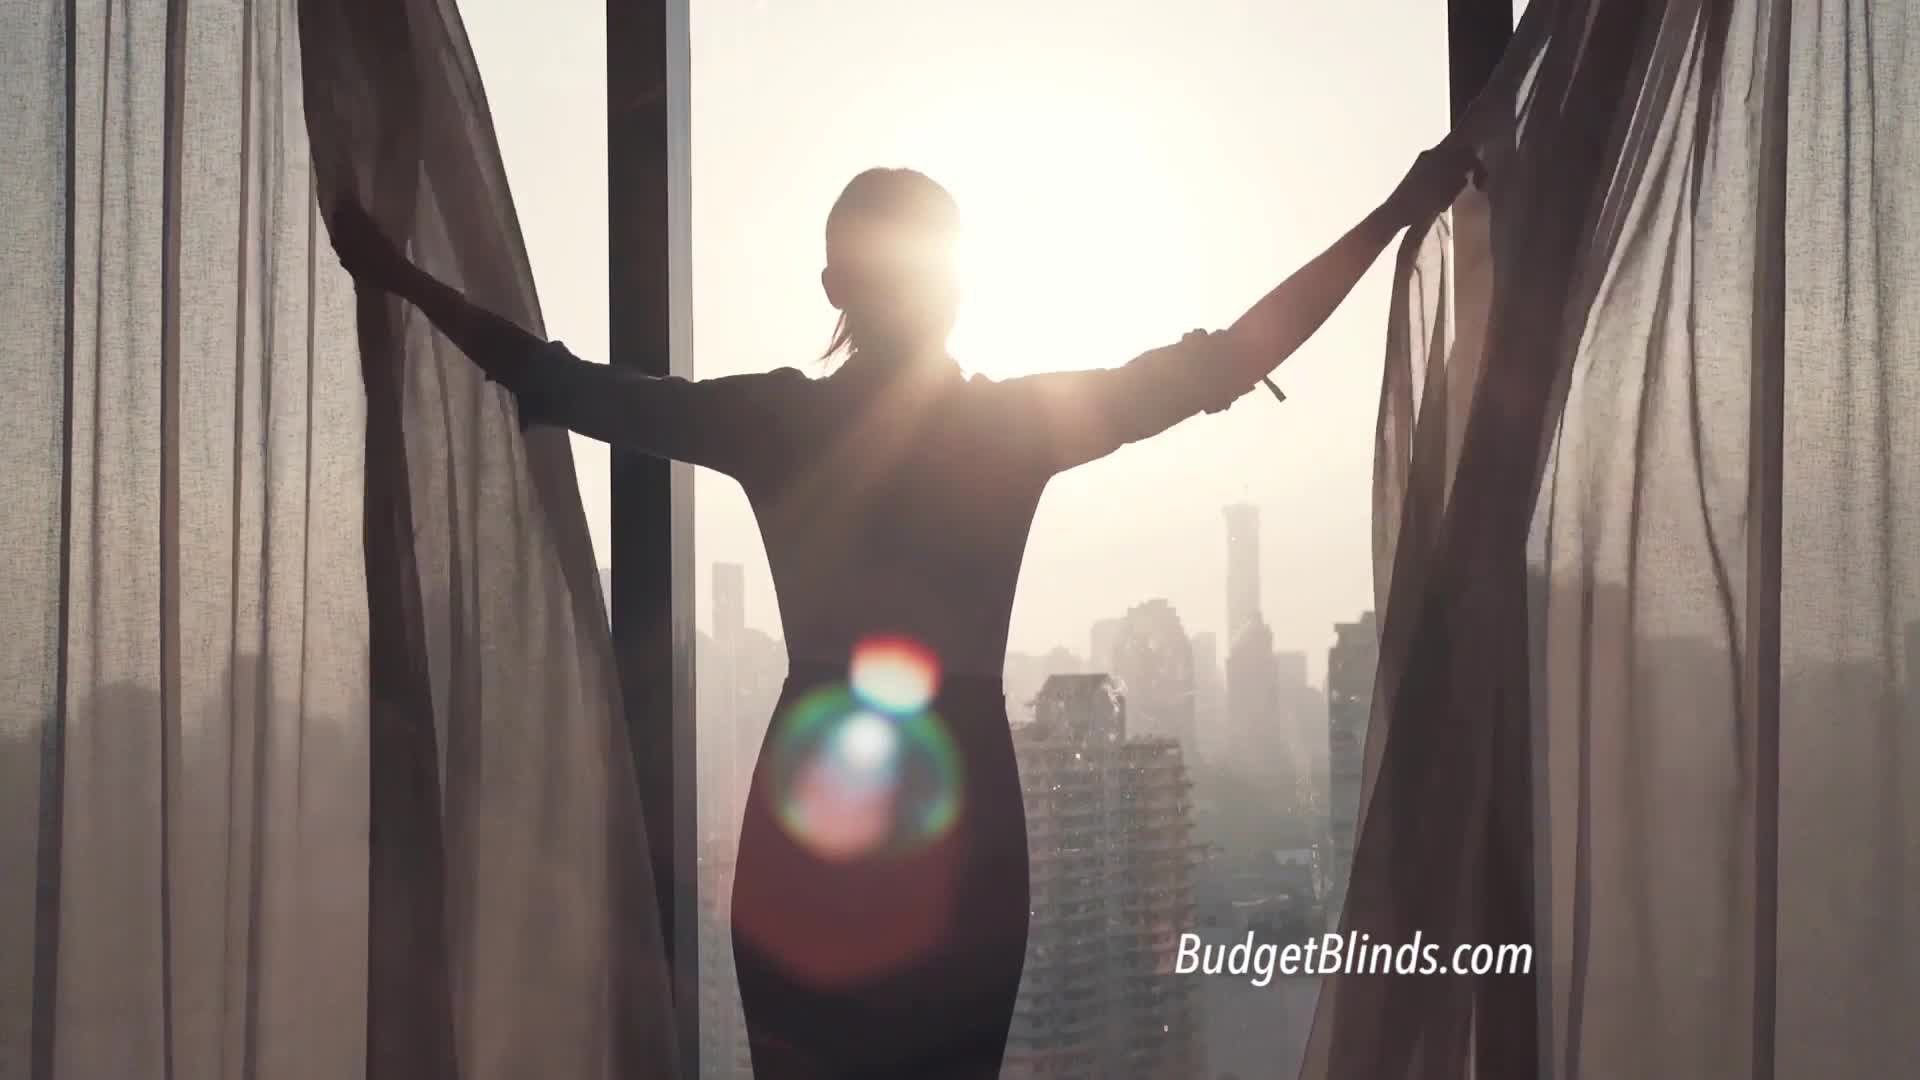 video Budget Blinds